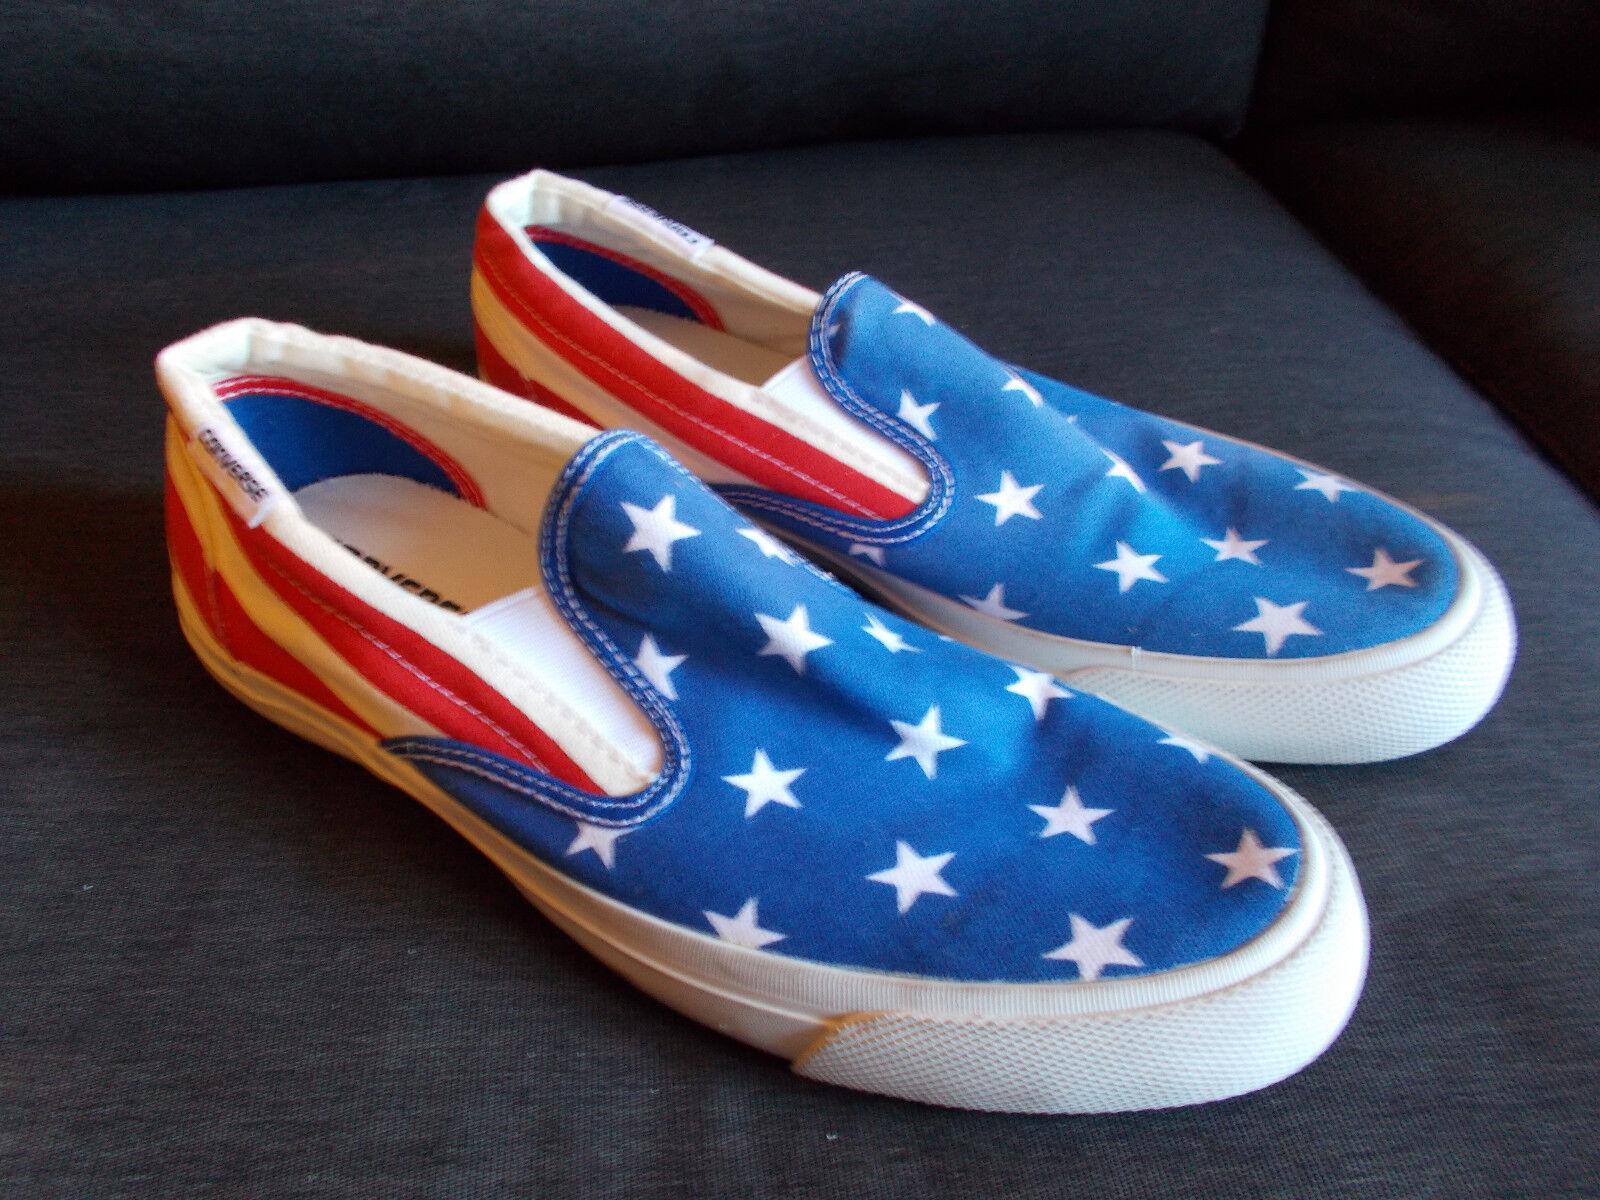 Converse Stars And Stripes Low Top Slip On Trainers UK7.5 EU 41 Blau Mix BNWoT